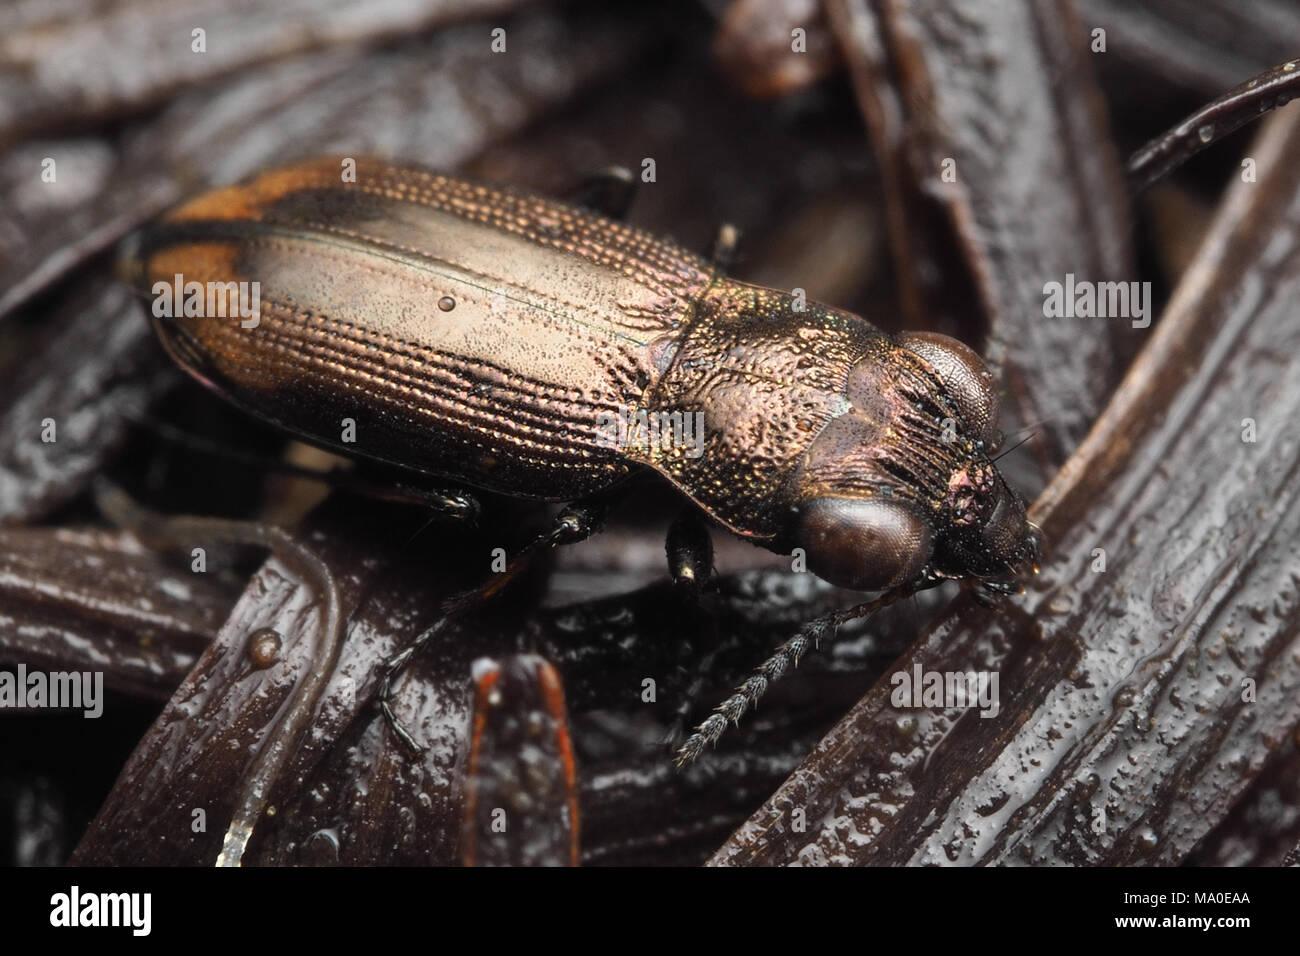 Ground Beetle (Notiophilus biguttatus) on bare groung in woodland. - Stock Image